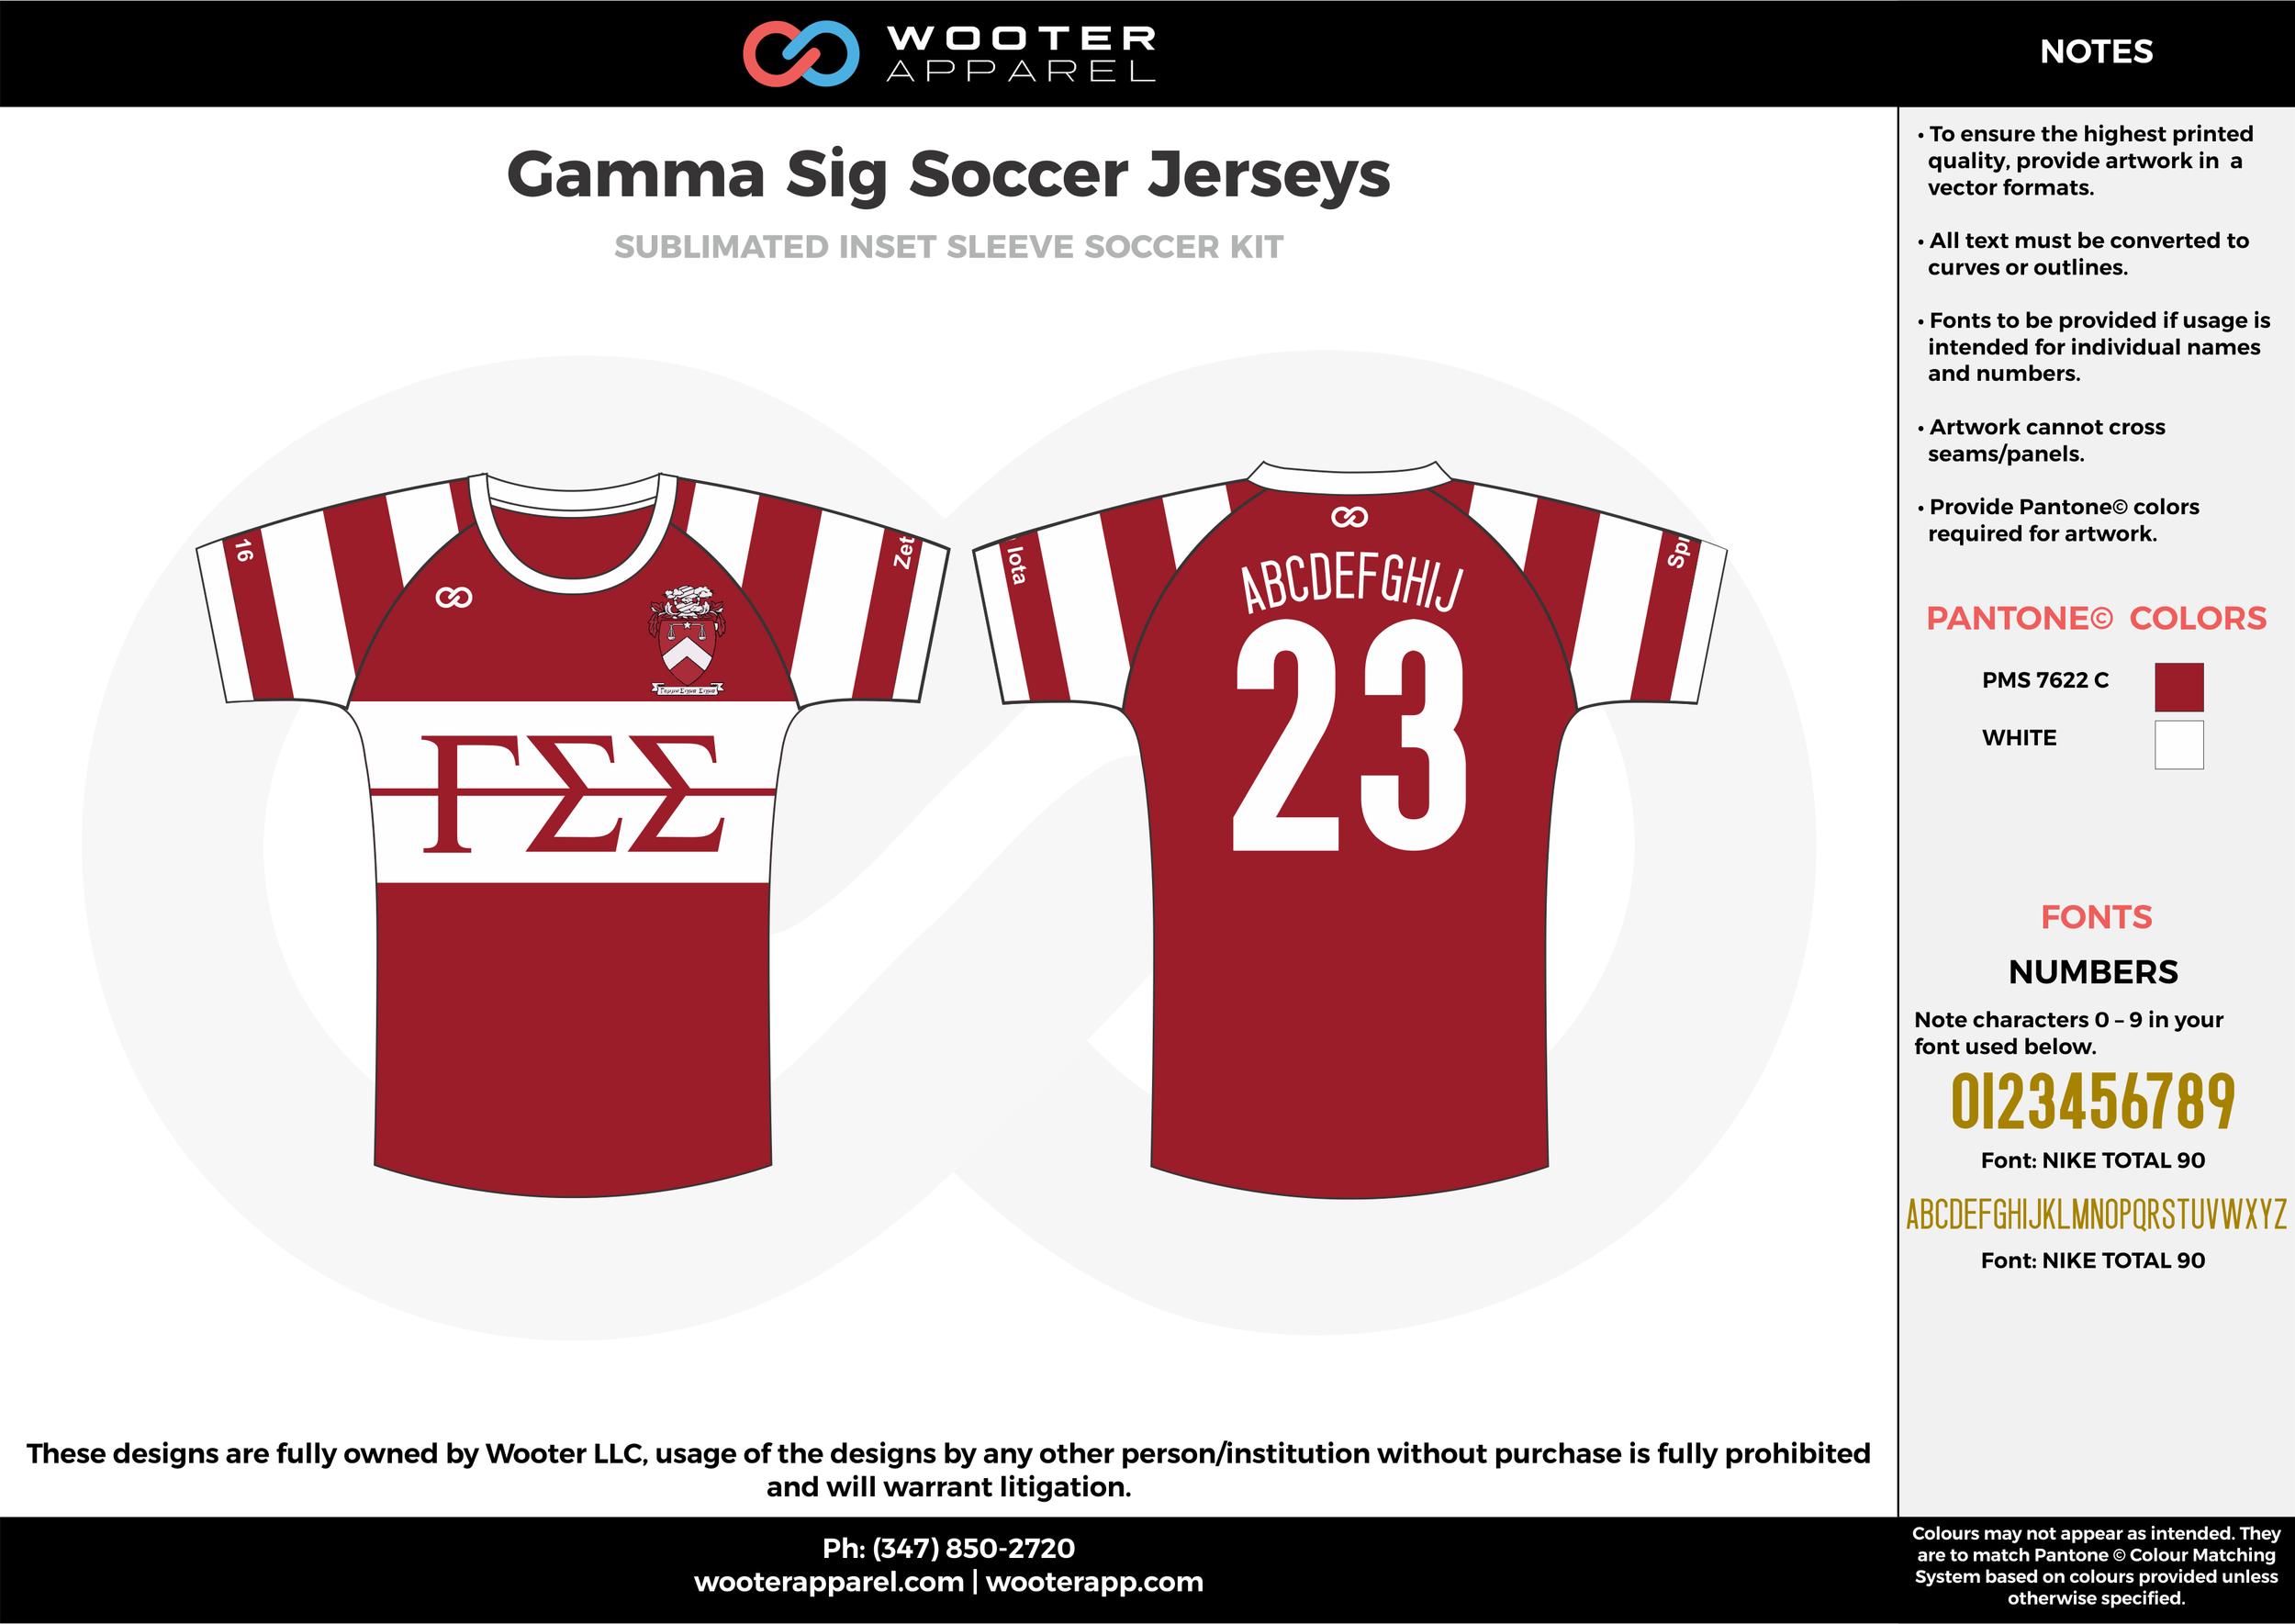 Gamma Sig white maroon custom sublimated soccer uniform jersey shirt